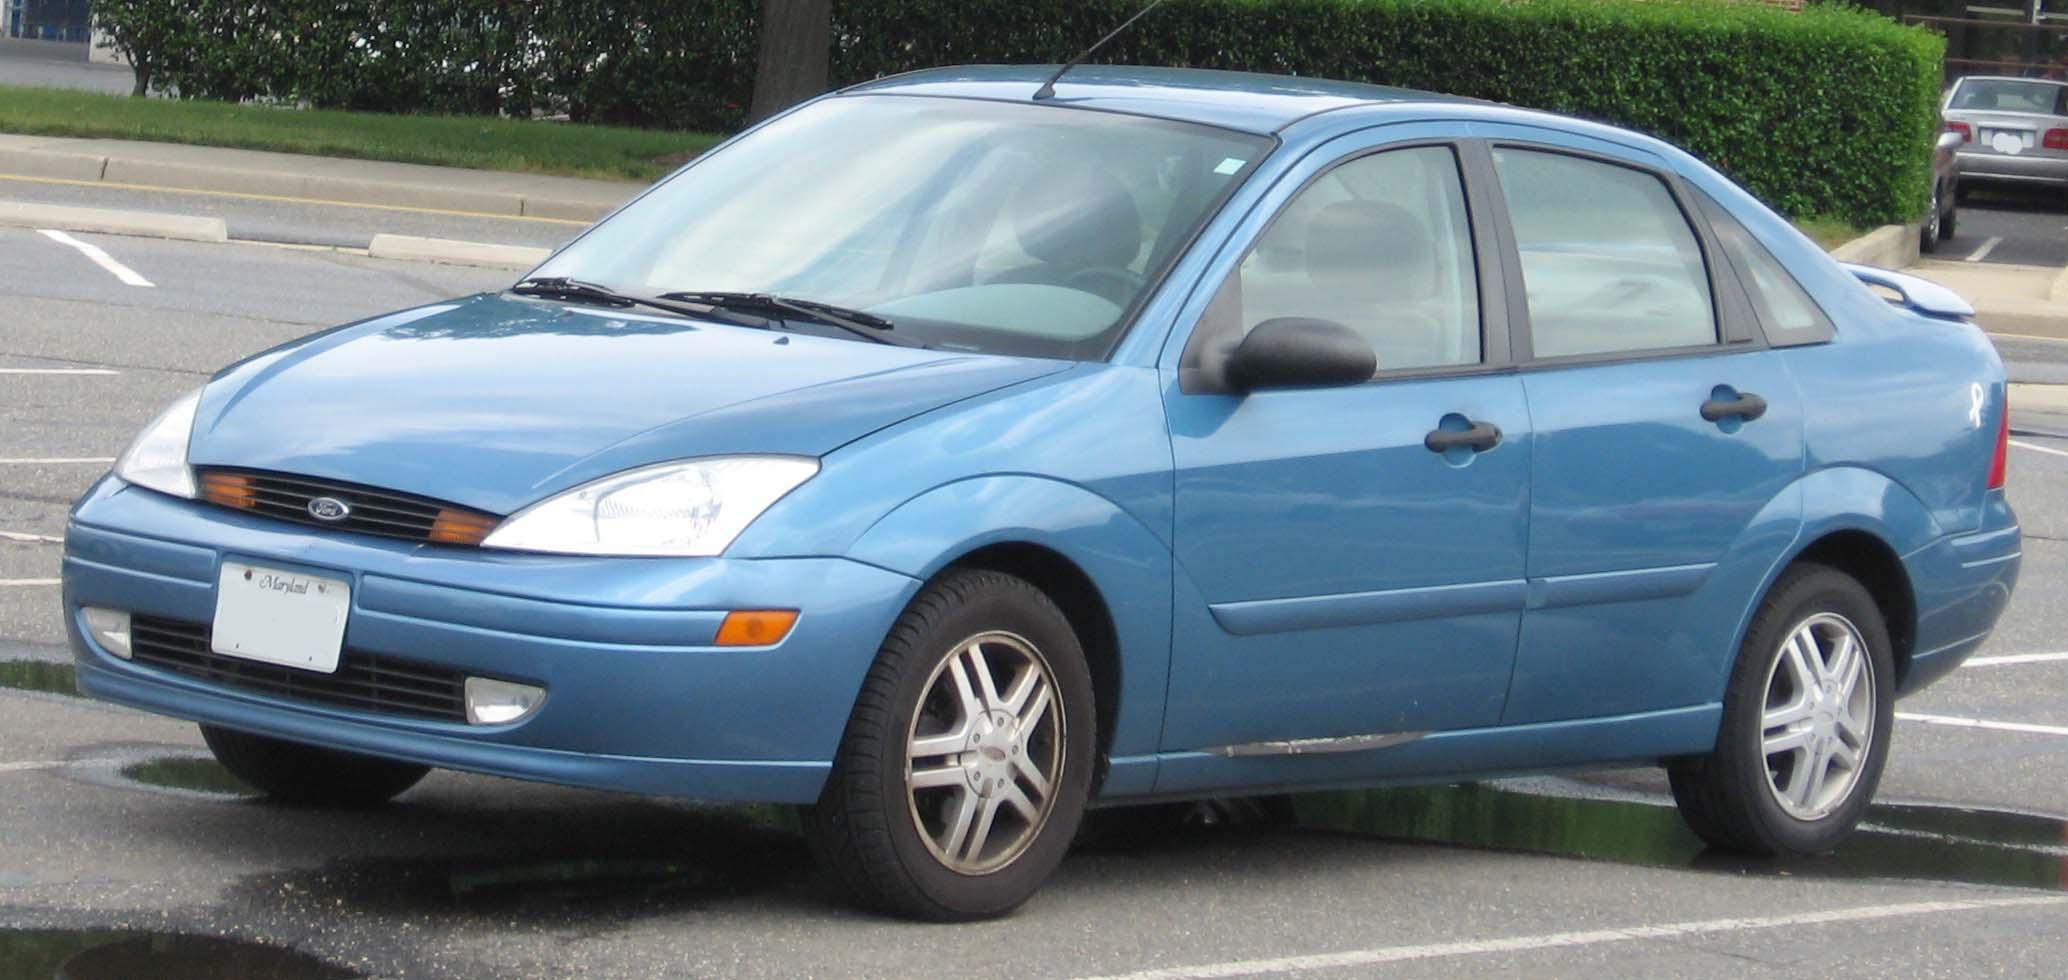 file00 04 ford focus se sedanjpg - Ford Focus 2007 Sedan